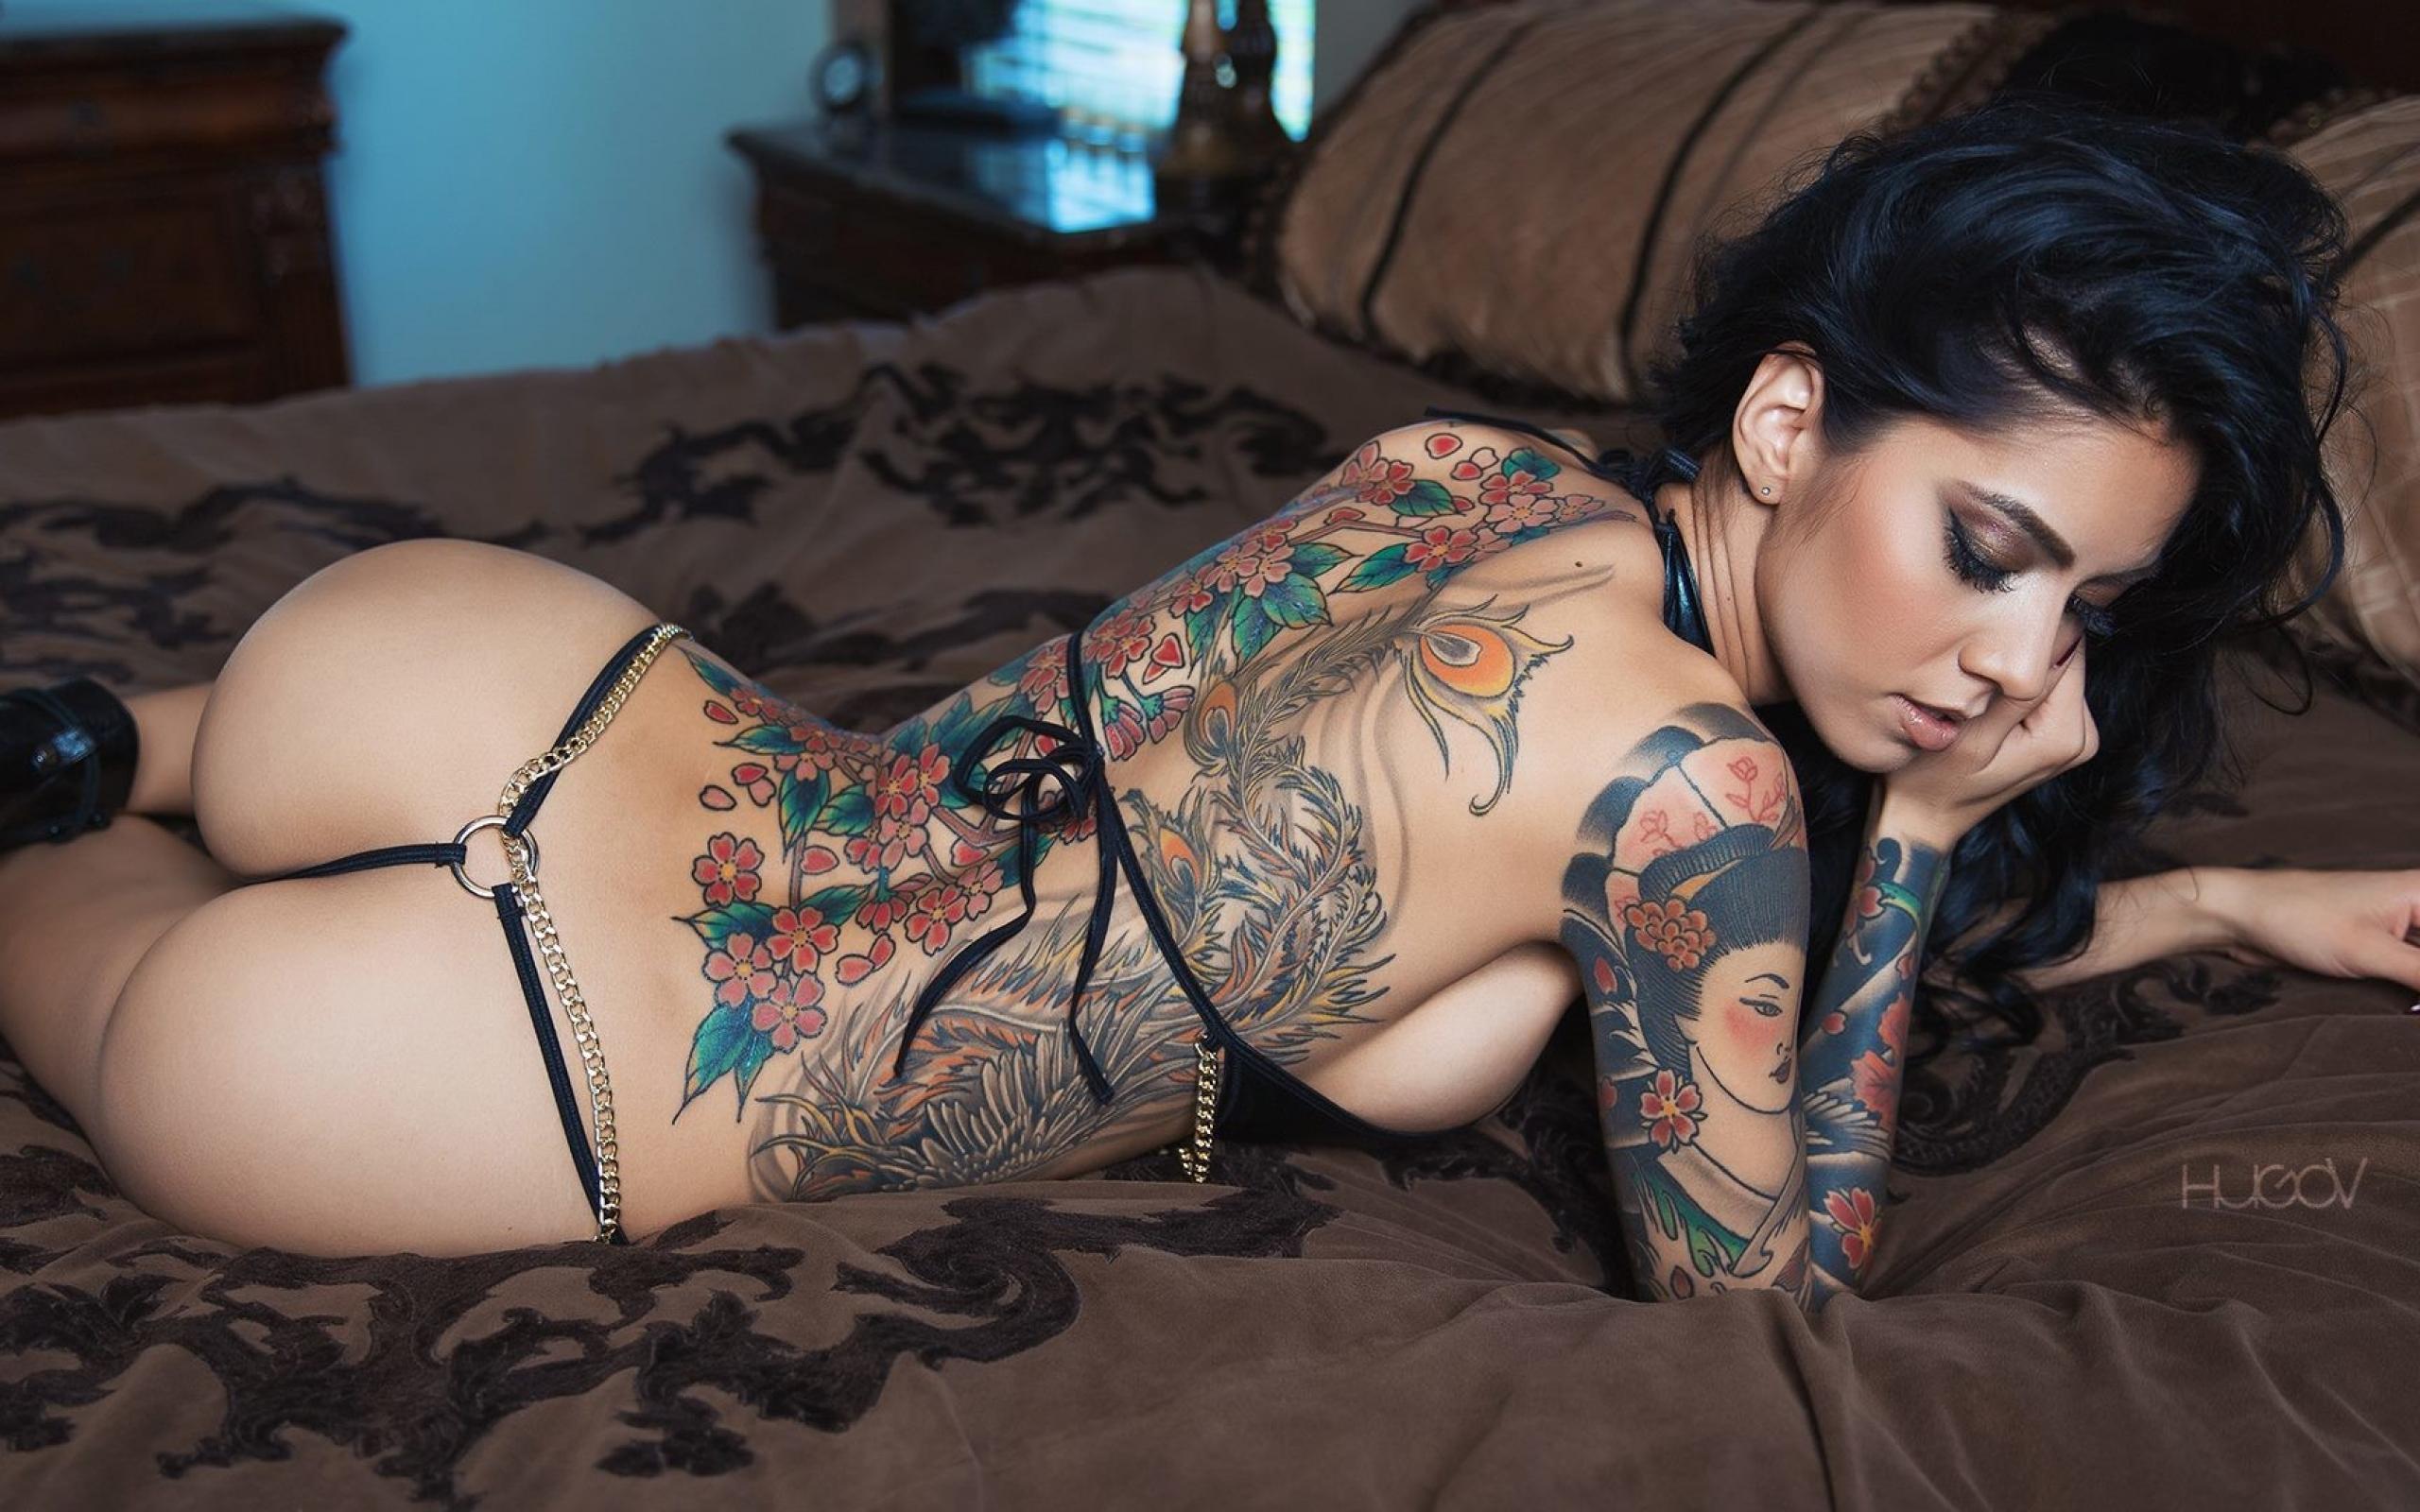 Extreme tribe tattoos on naked babes — photo 12